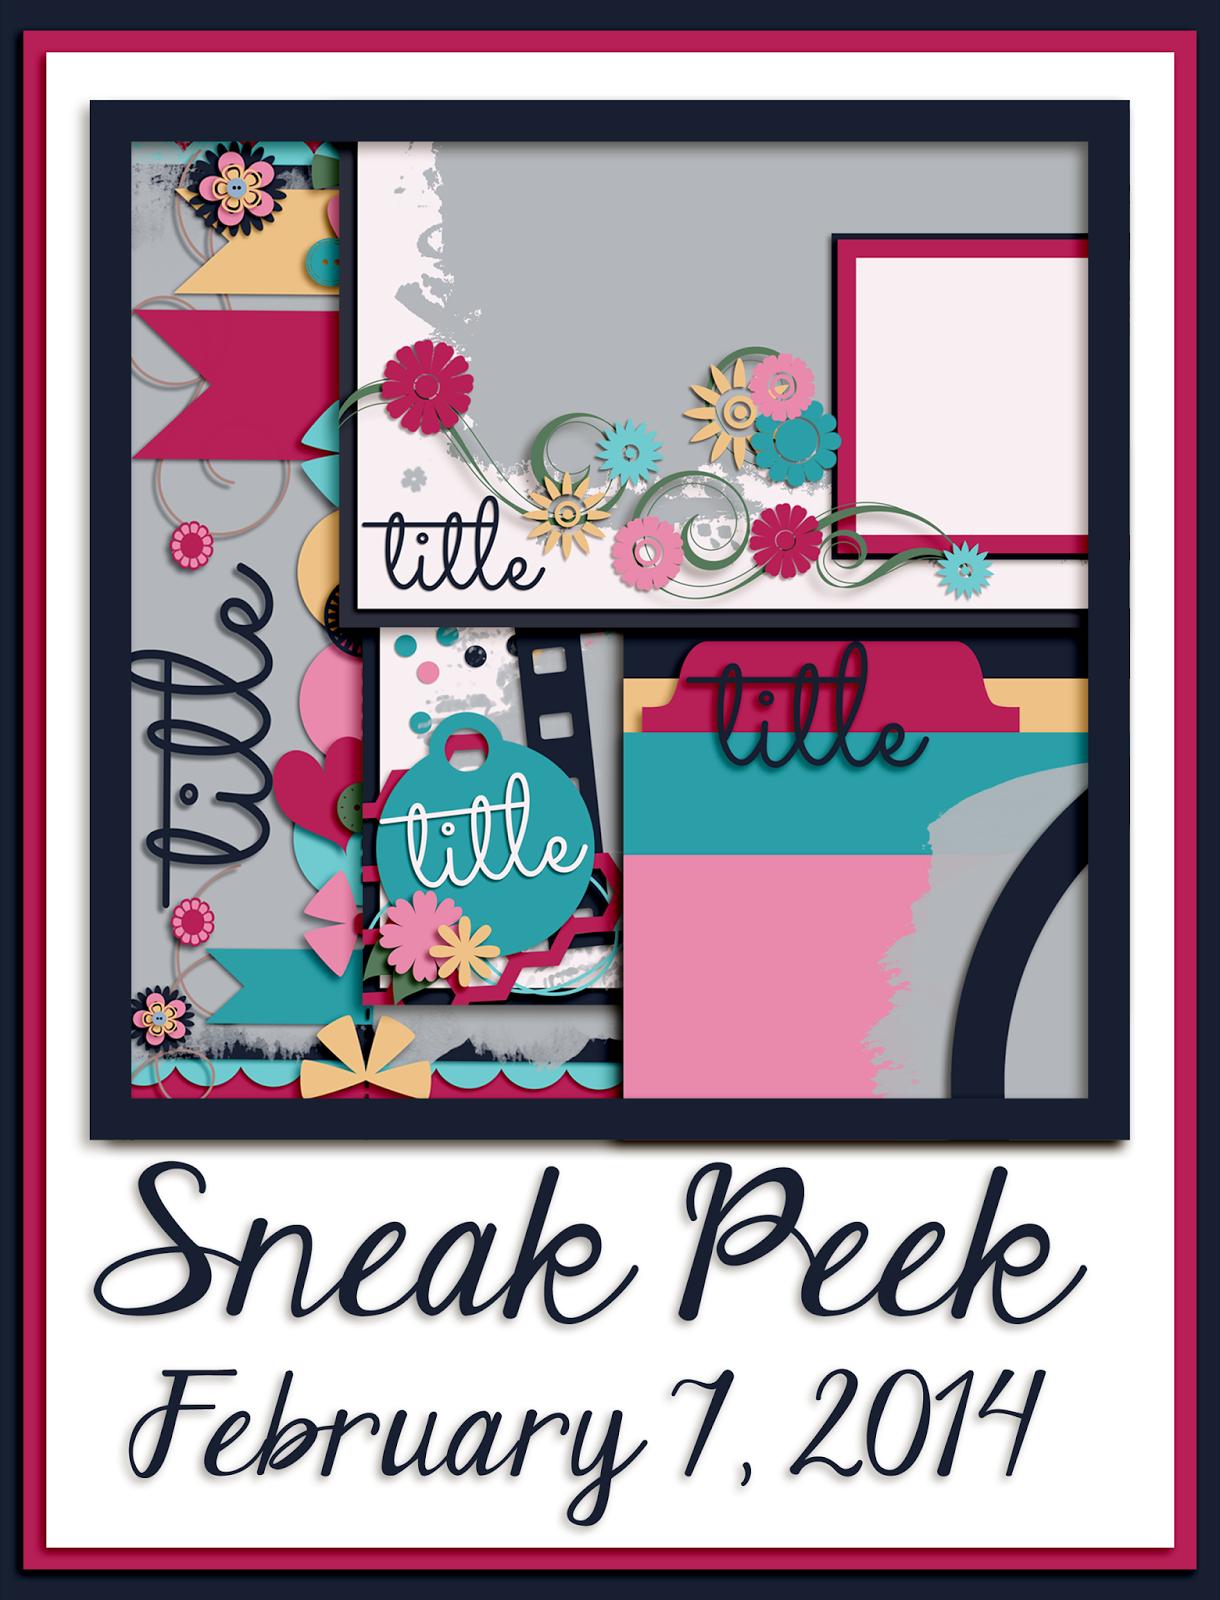 Sneak Peek for February 7, 2014